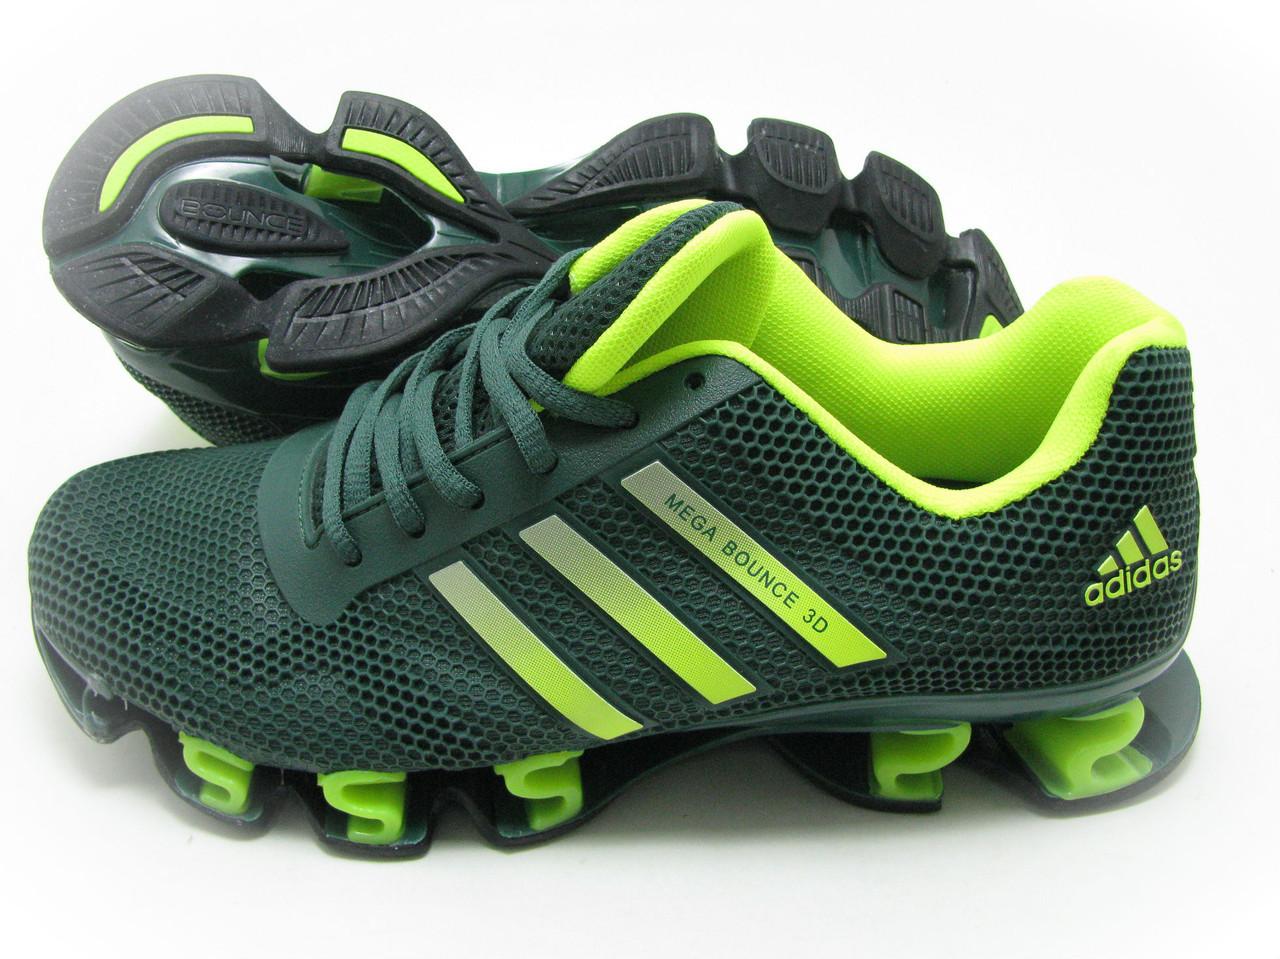 Мужские кроссовки Adidas Bounce green , фото 1